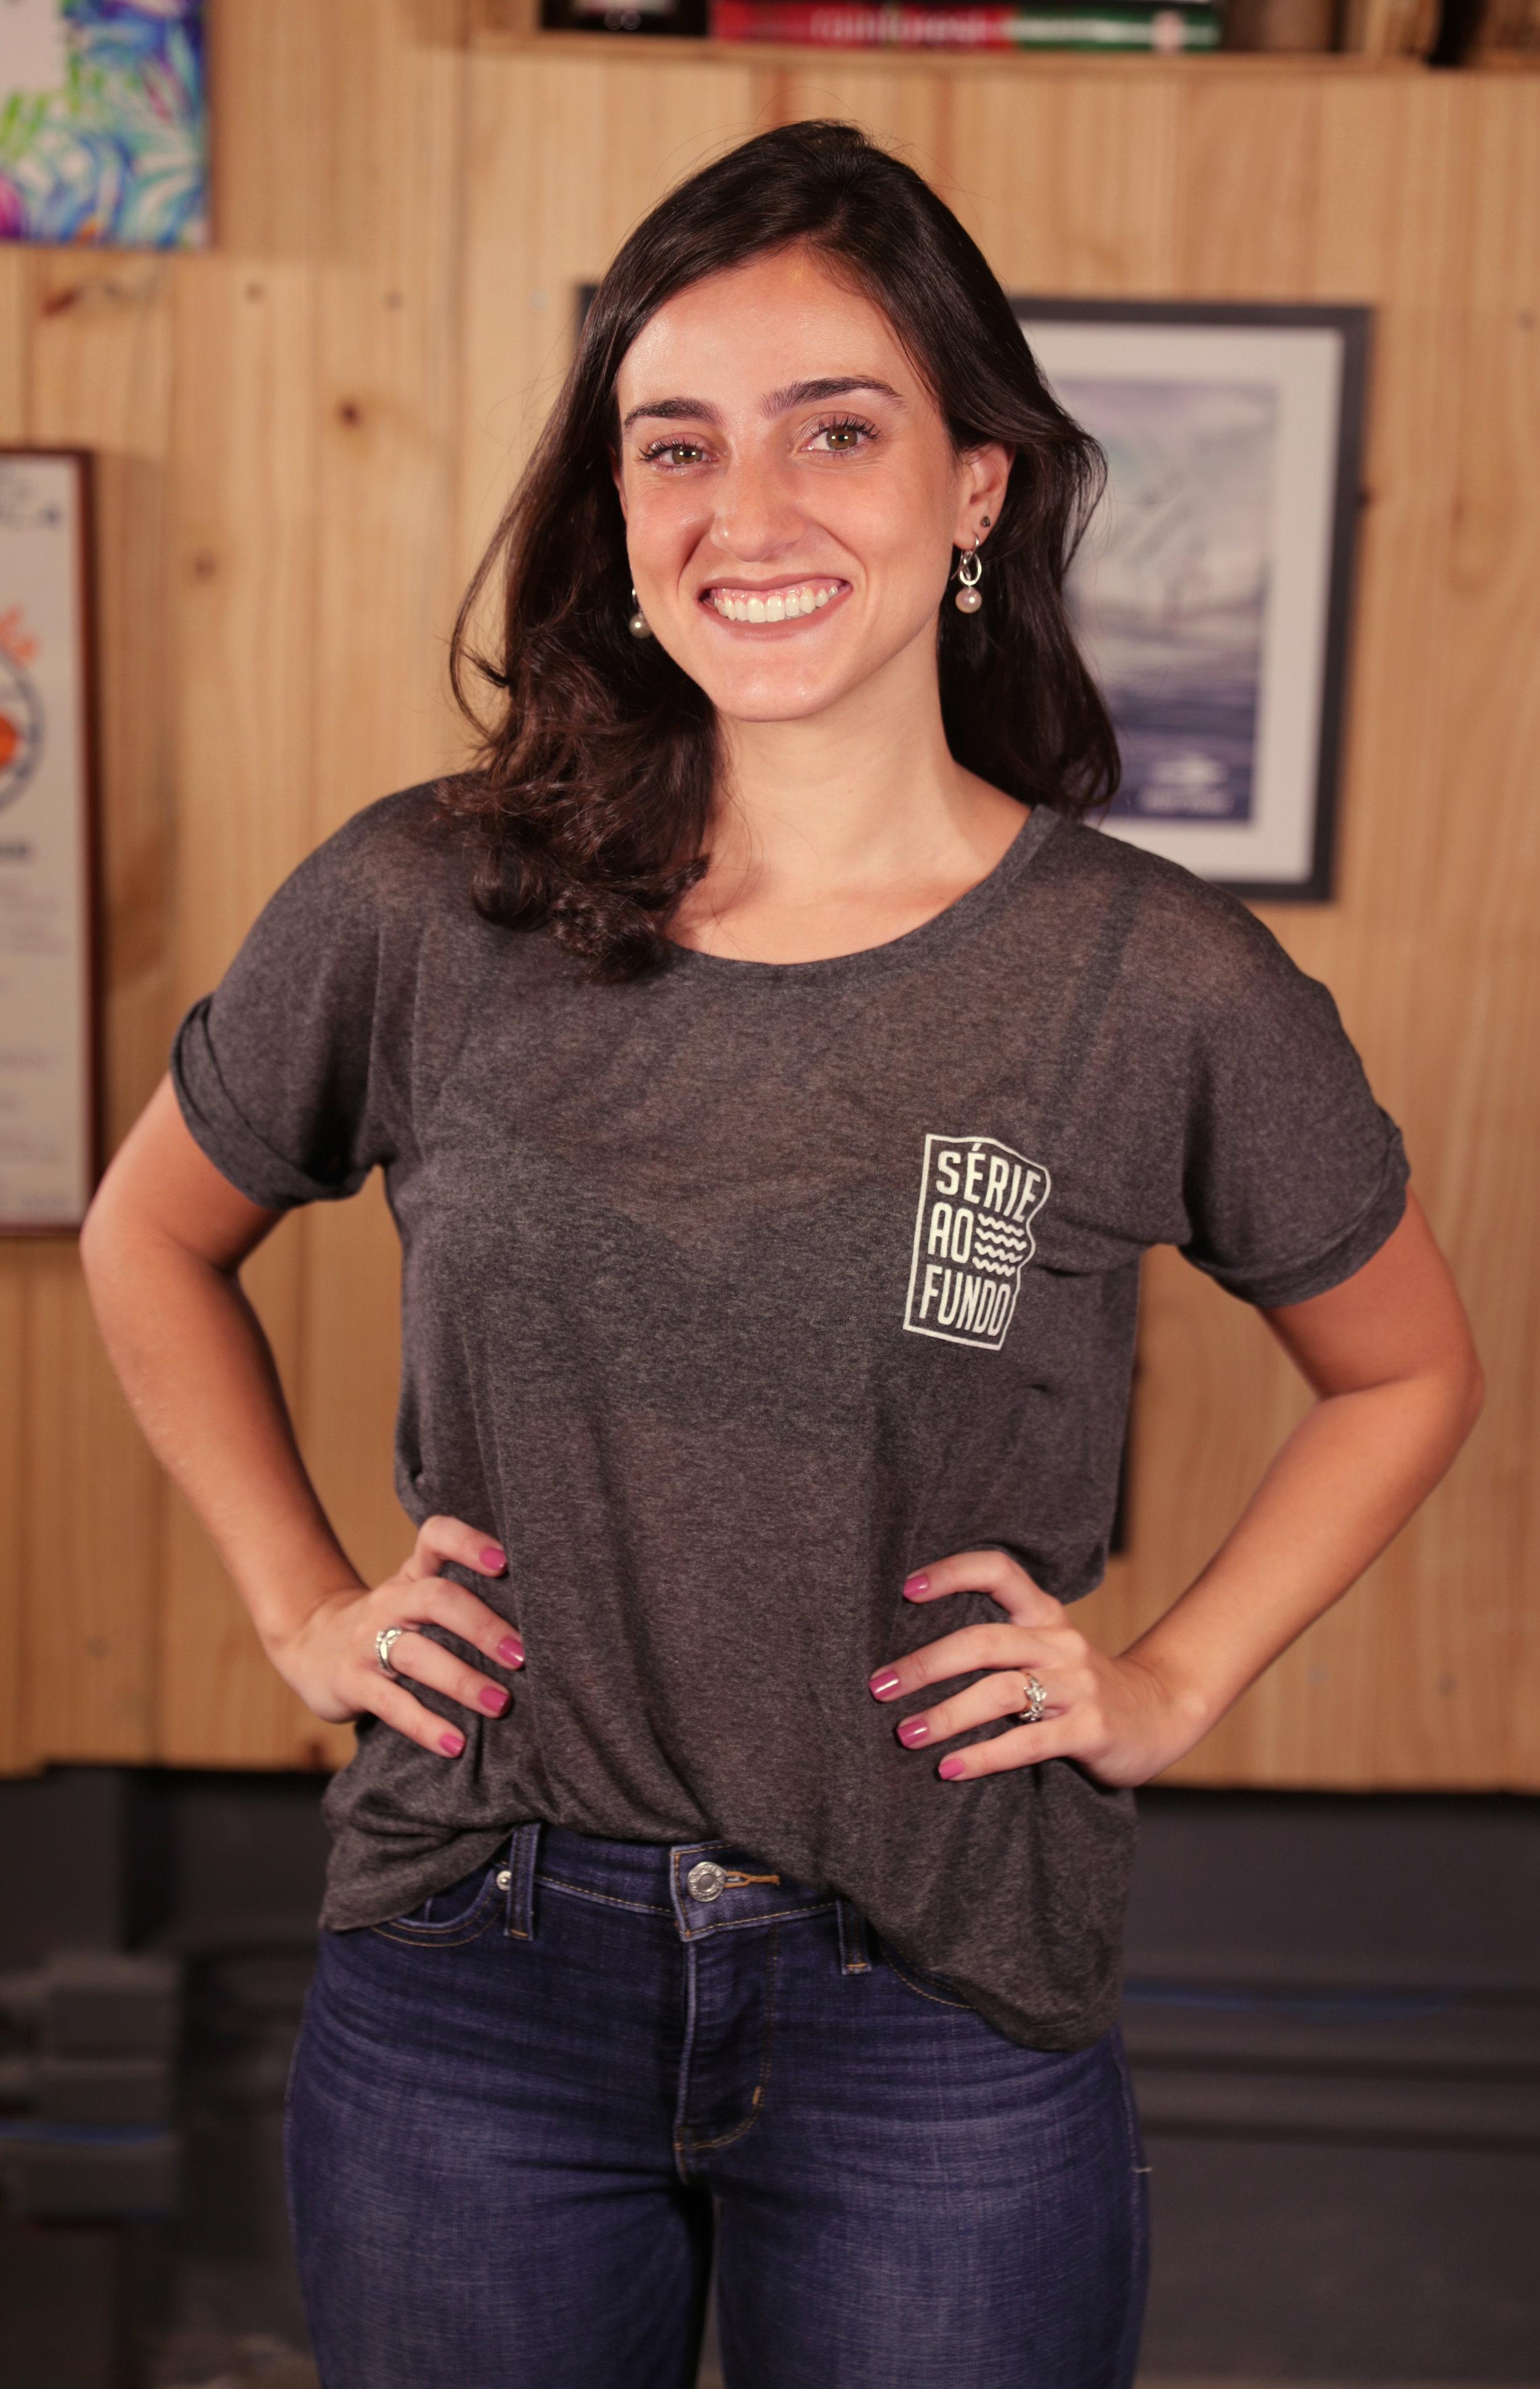 Camiseta SAF Feminina | Frente - cópia.jpg